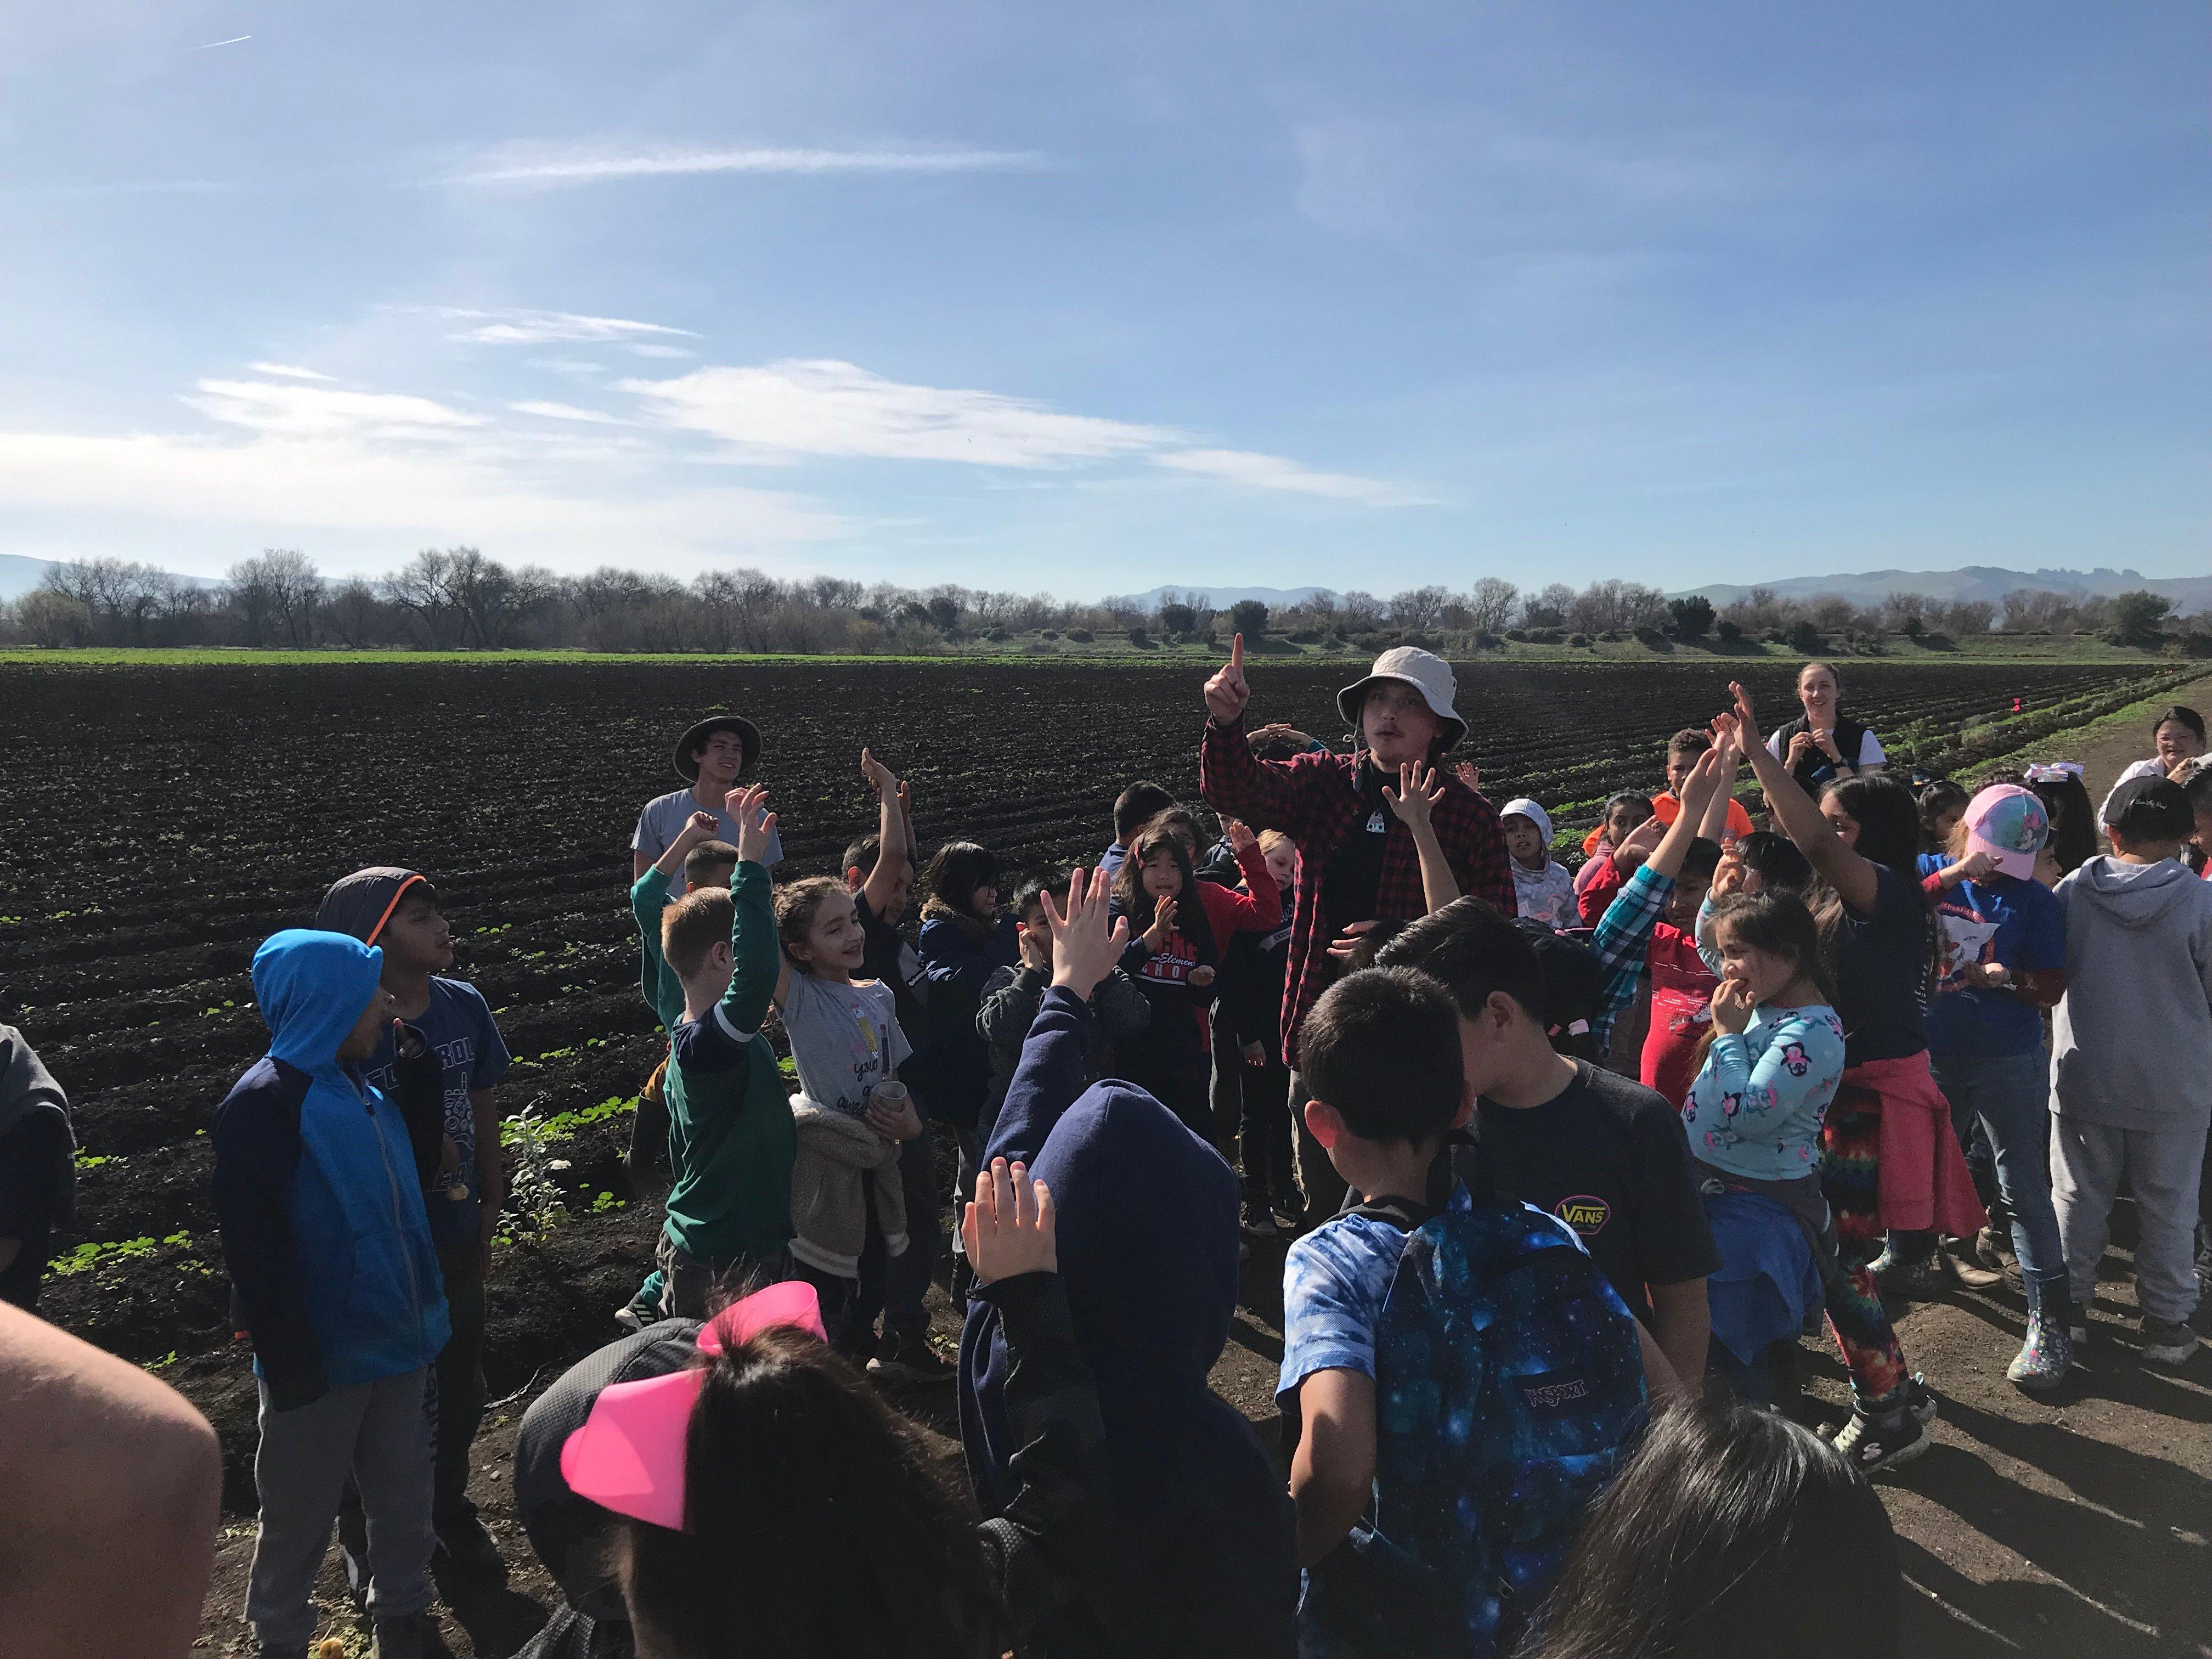 NPRAP - STRAW Hedgerow Planting - A.Pilon - 01-31-2020 - 175